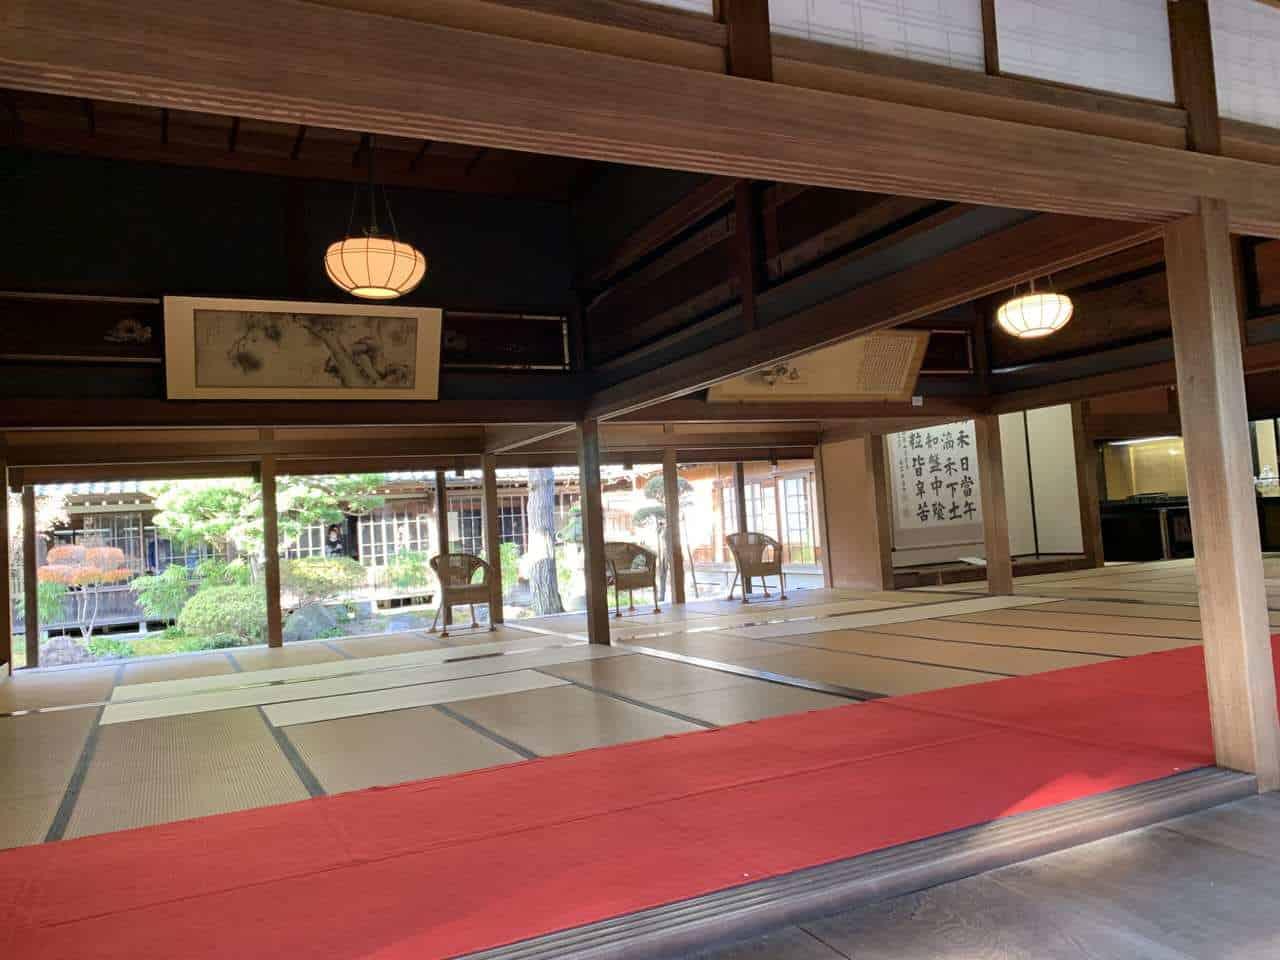 Grande salle d'un musée de Niigata